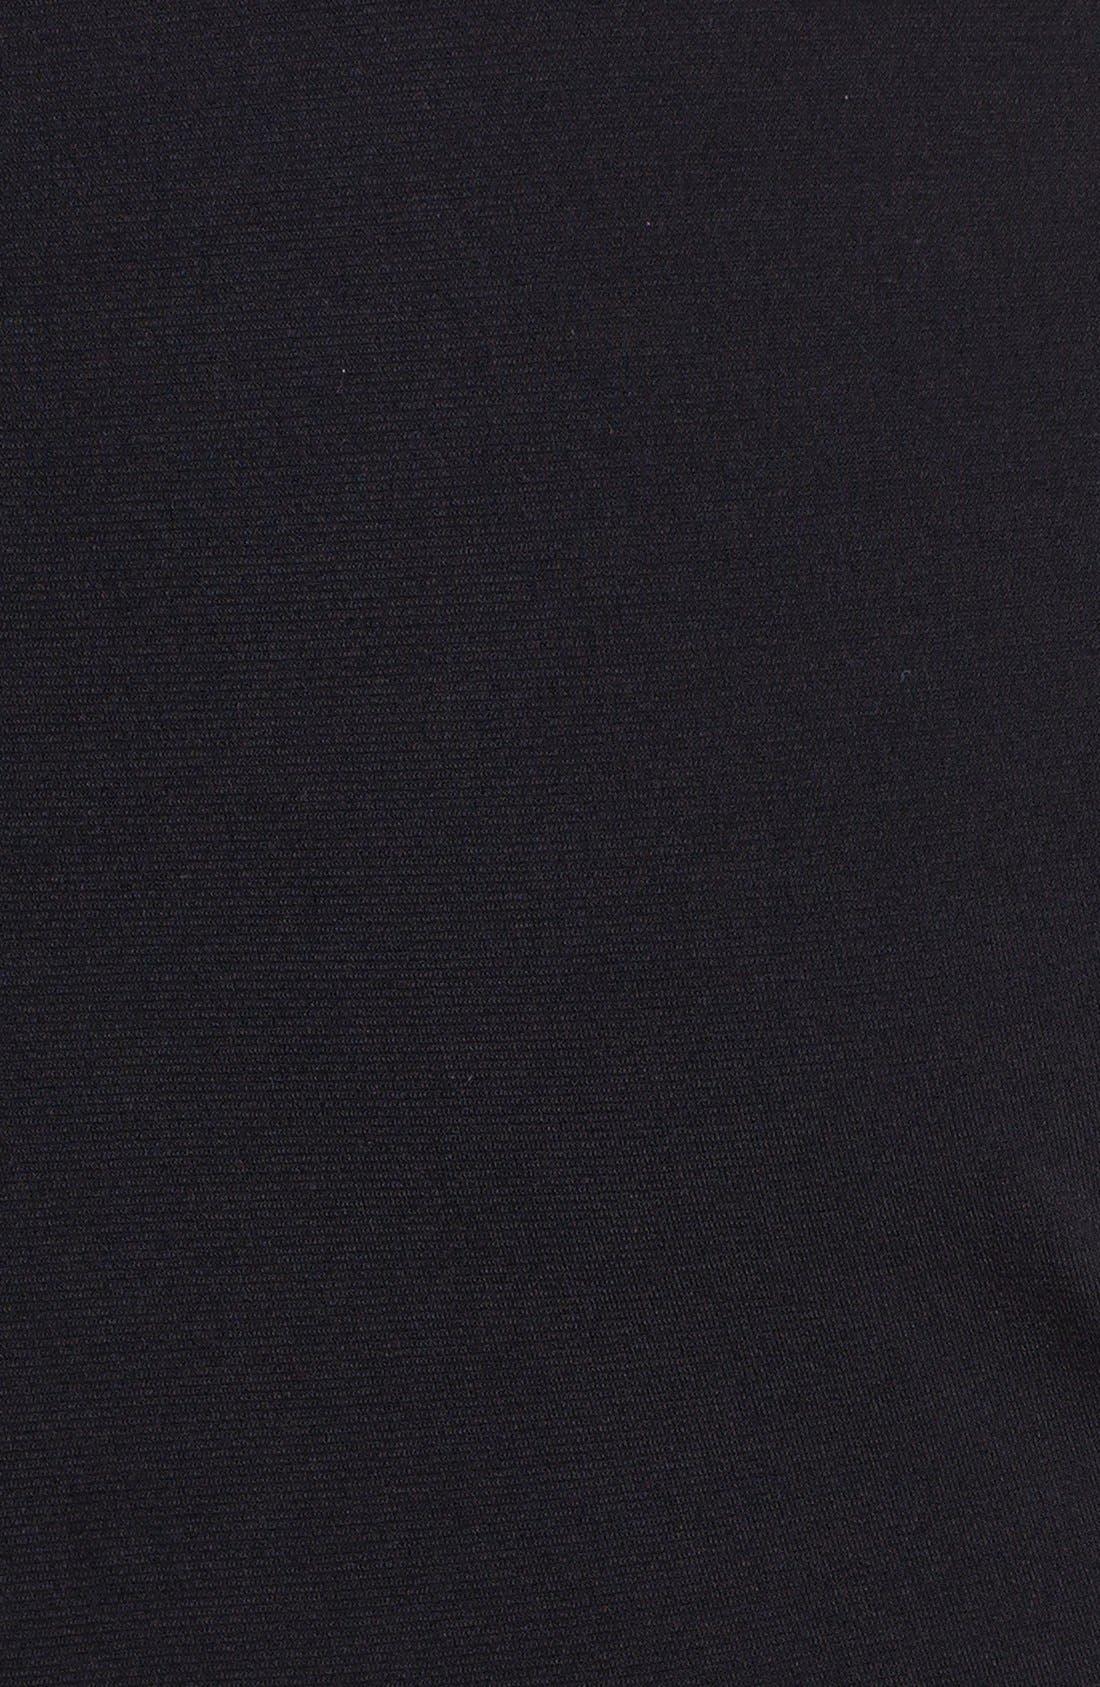 Alternate Image 3  - Evans Embellished Jersey Maxi Dress (Plus Size)